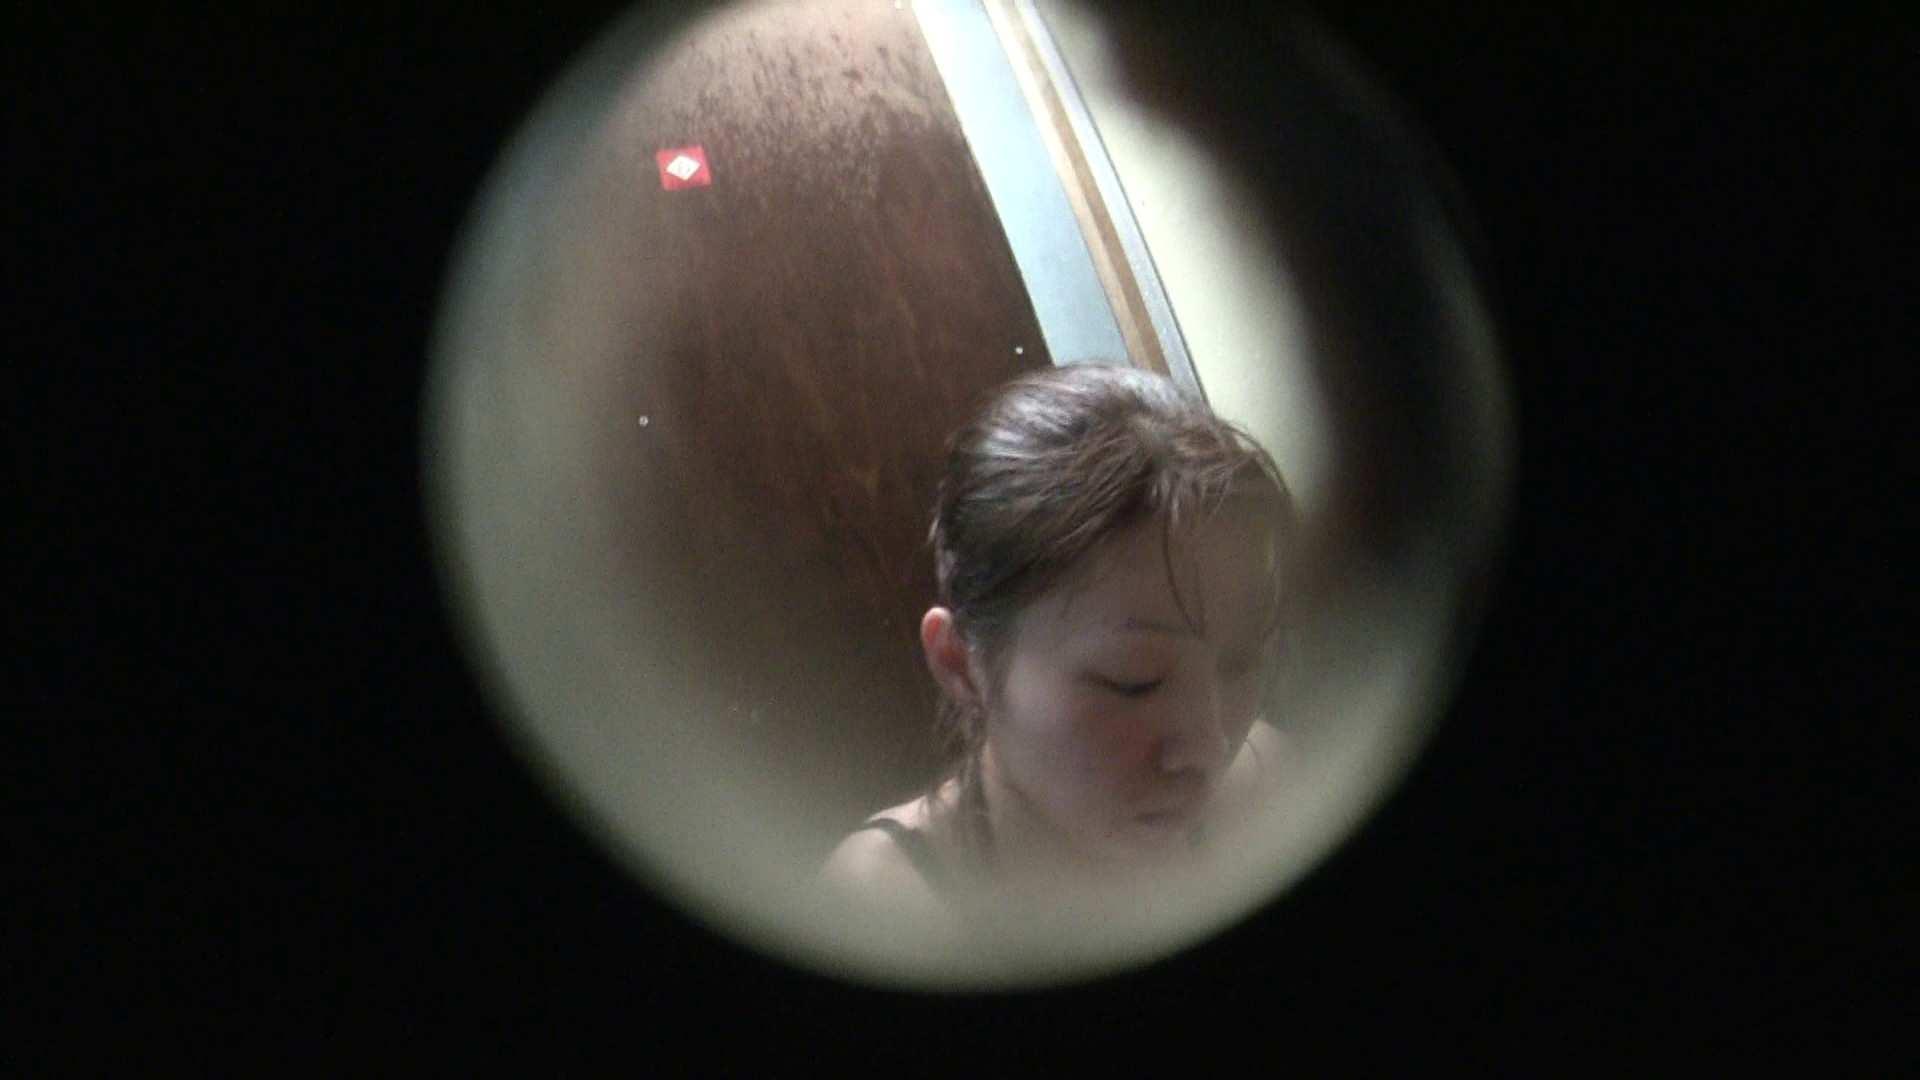 NO.01 胃下垂気味のへそピアスギャル 美乳 すけべAV動画紹介 78枚 75